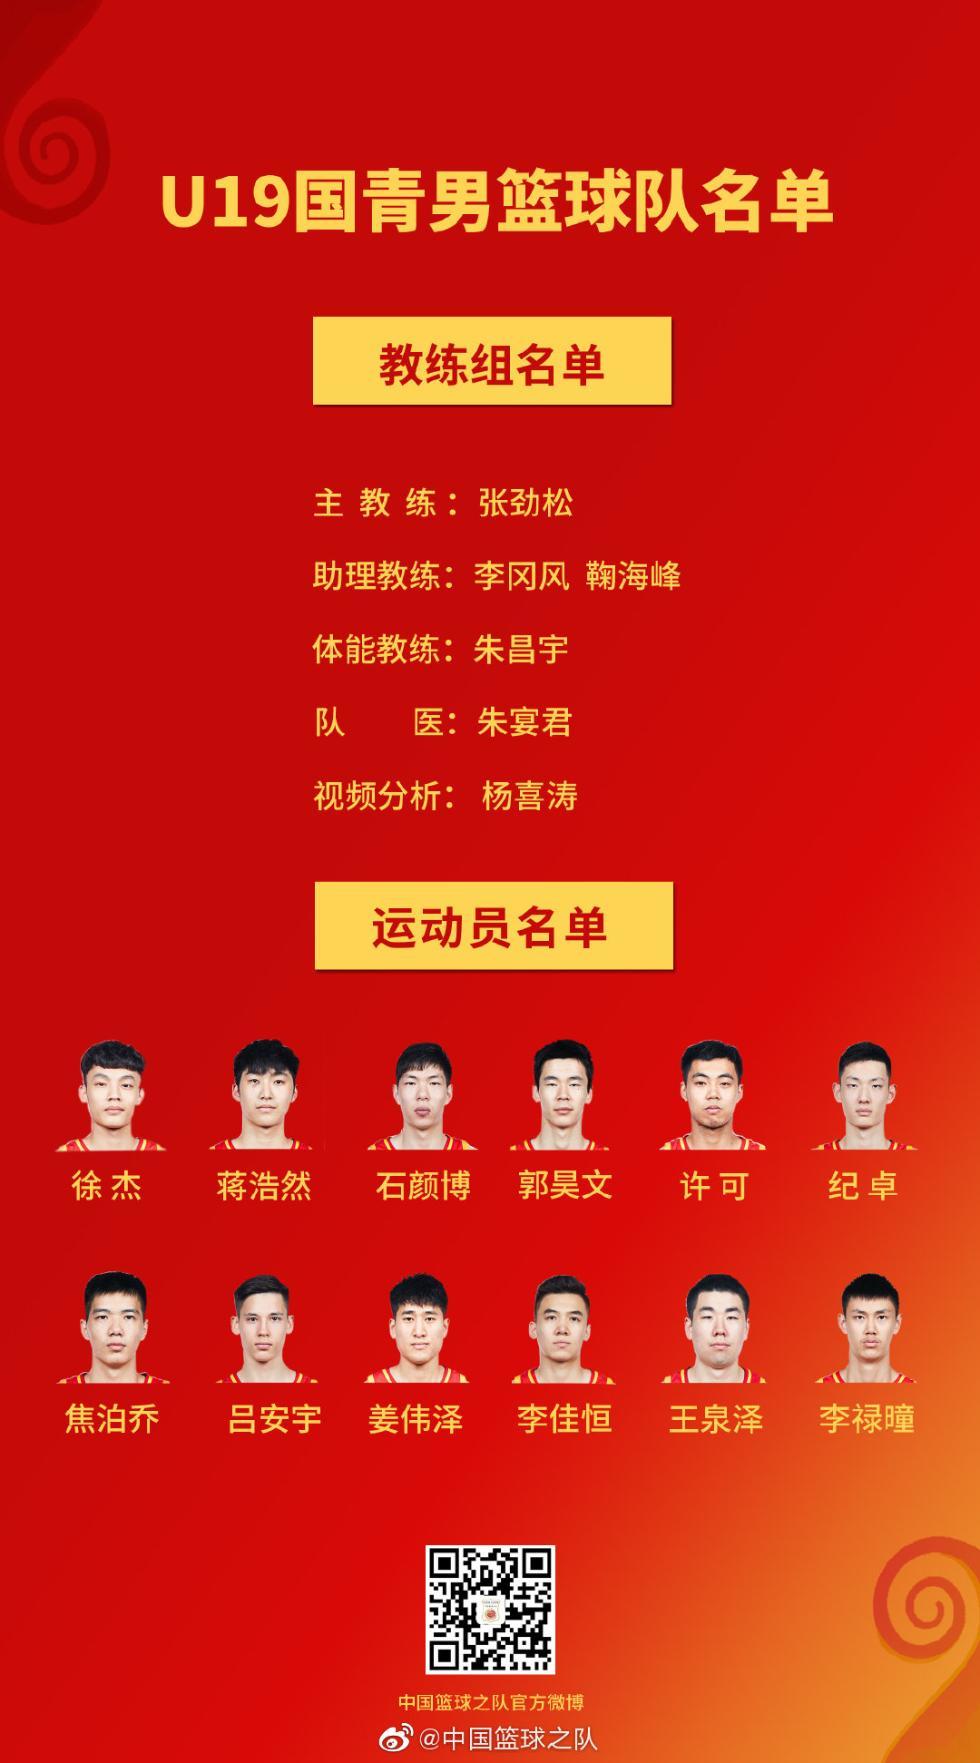 U19男篮世界杯中国队名单公布 郭昊文、徐杰领衔